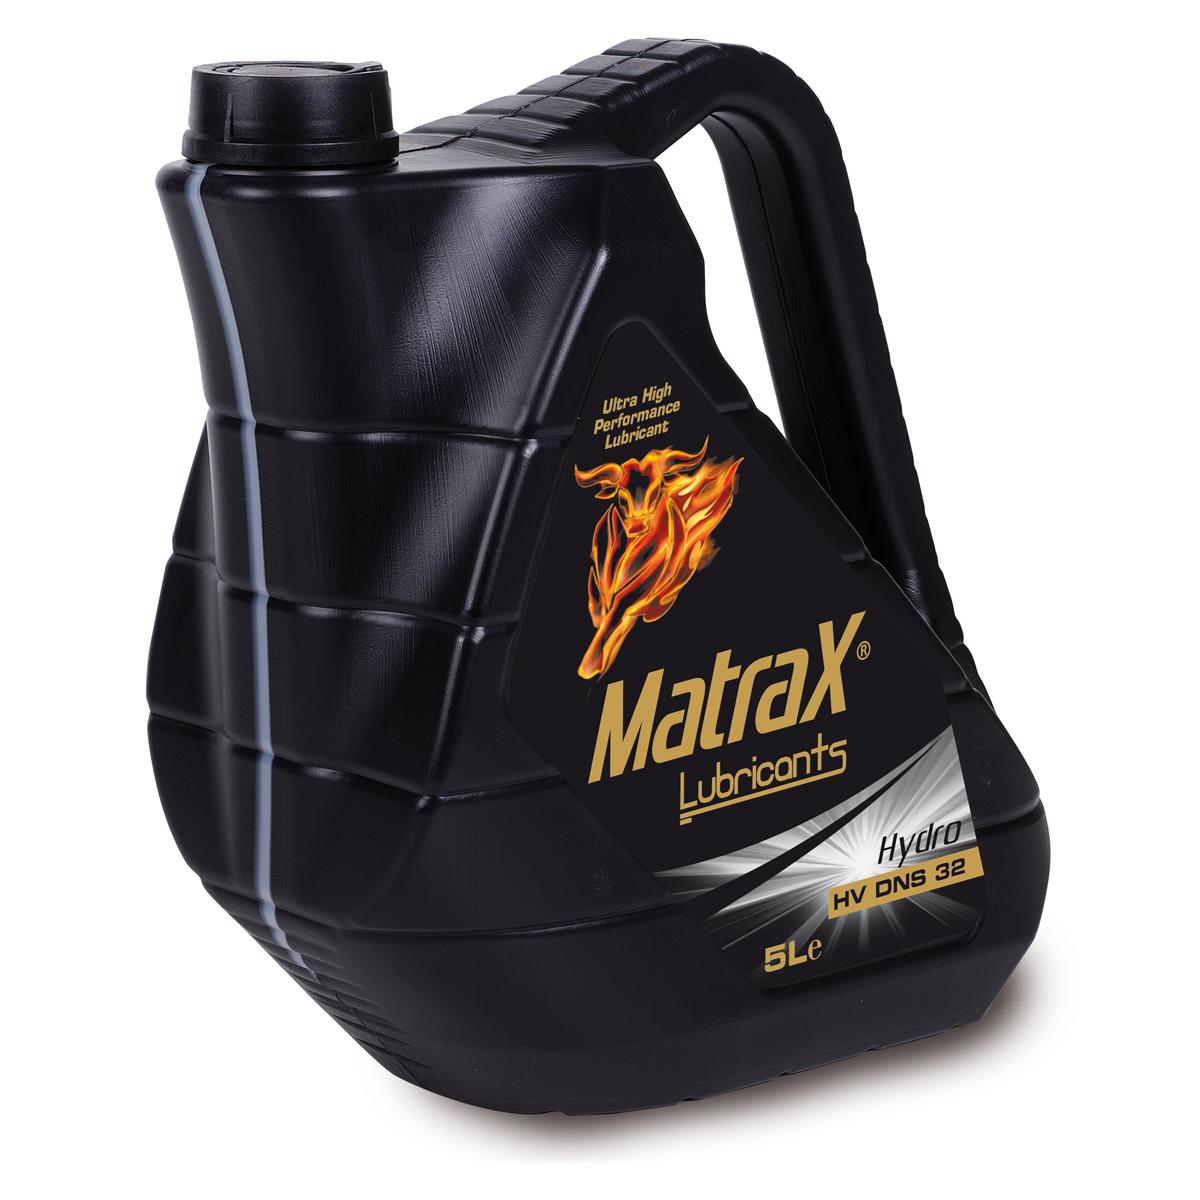 matrax-lubricants-hydro-hv-dns-32-5l